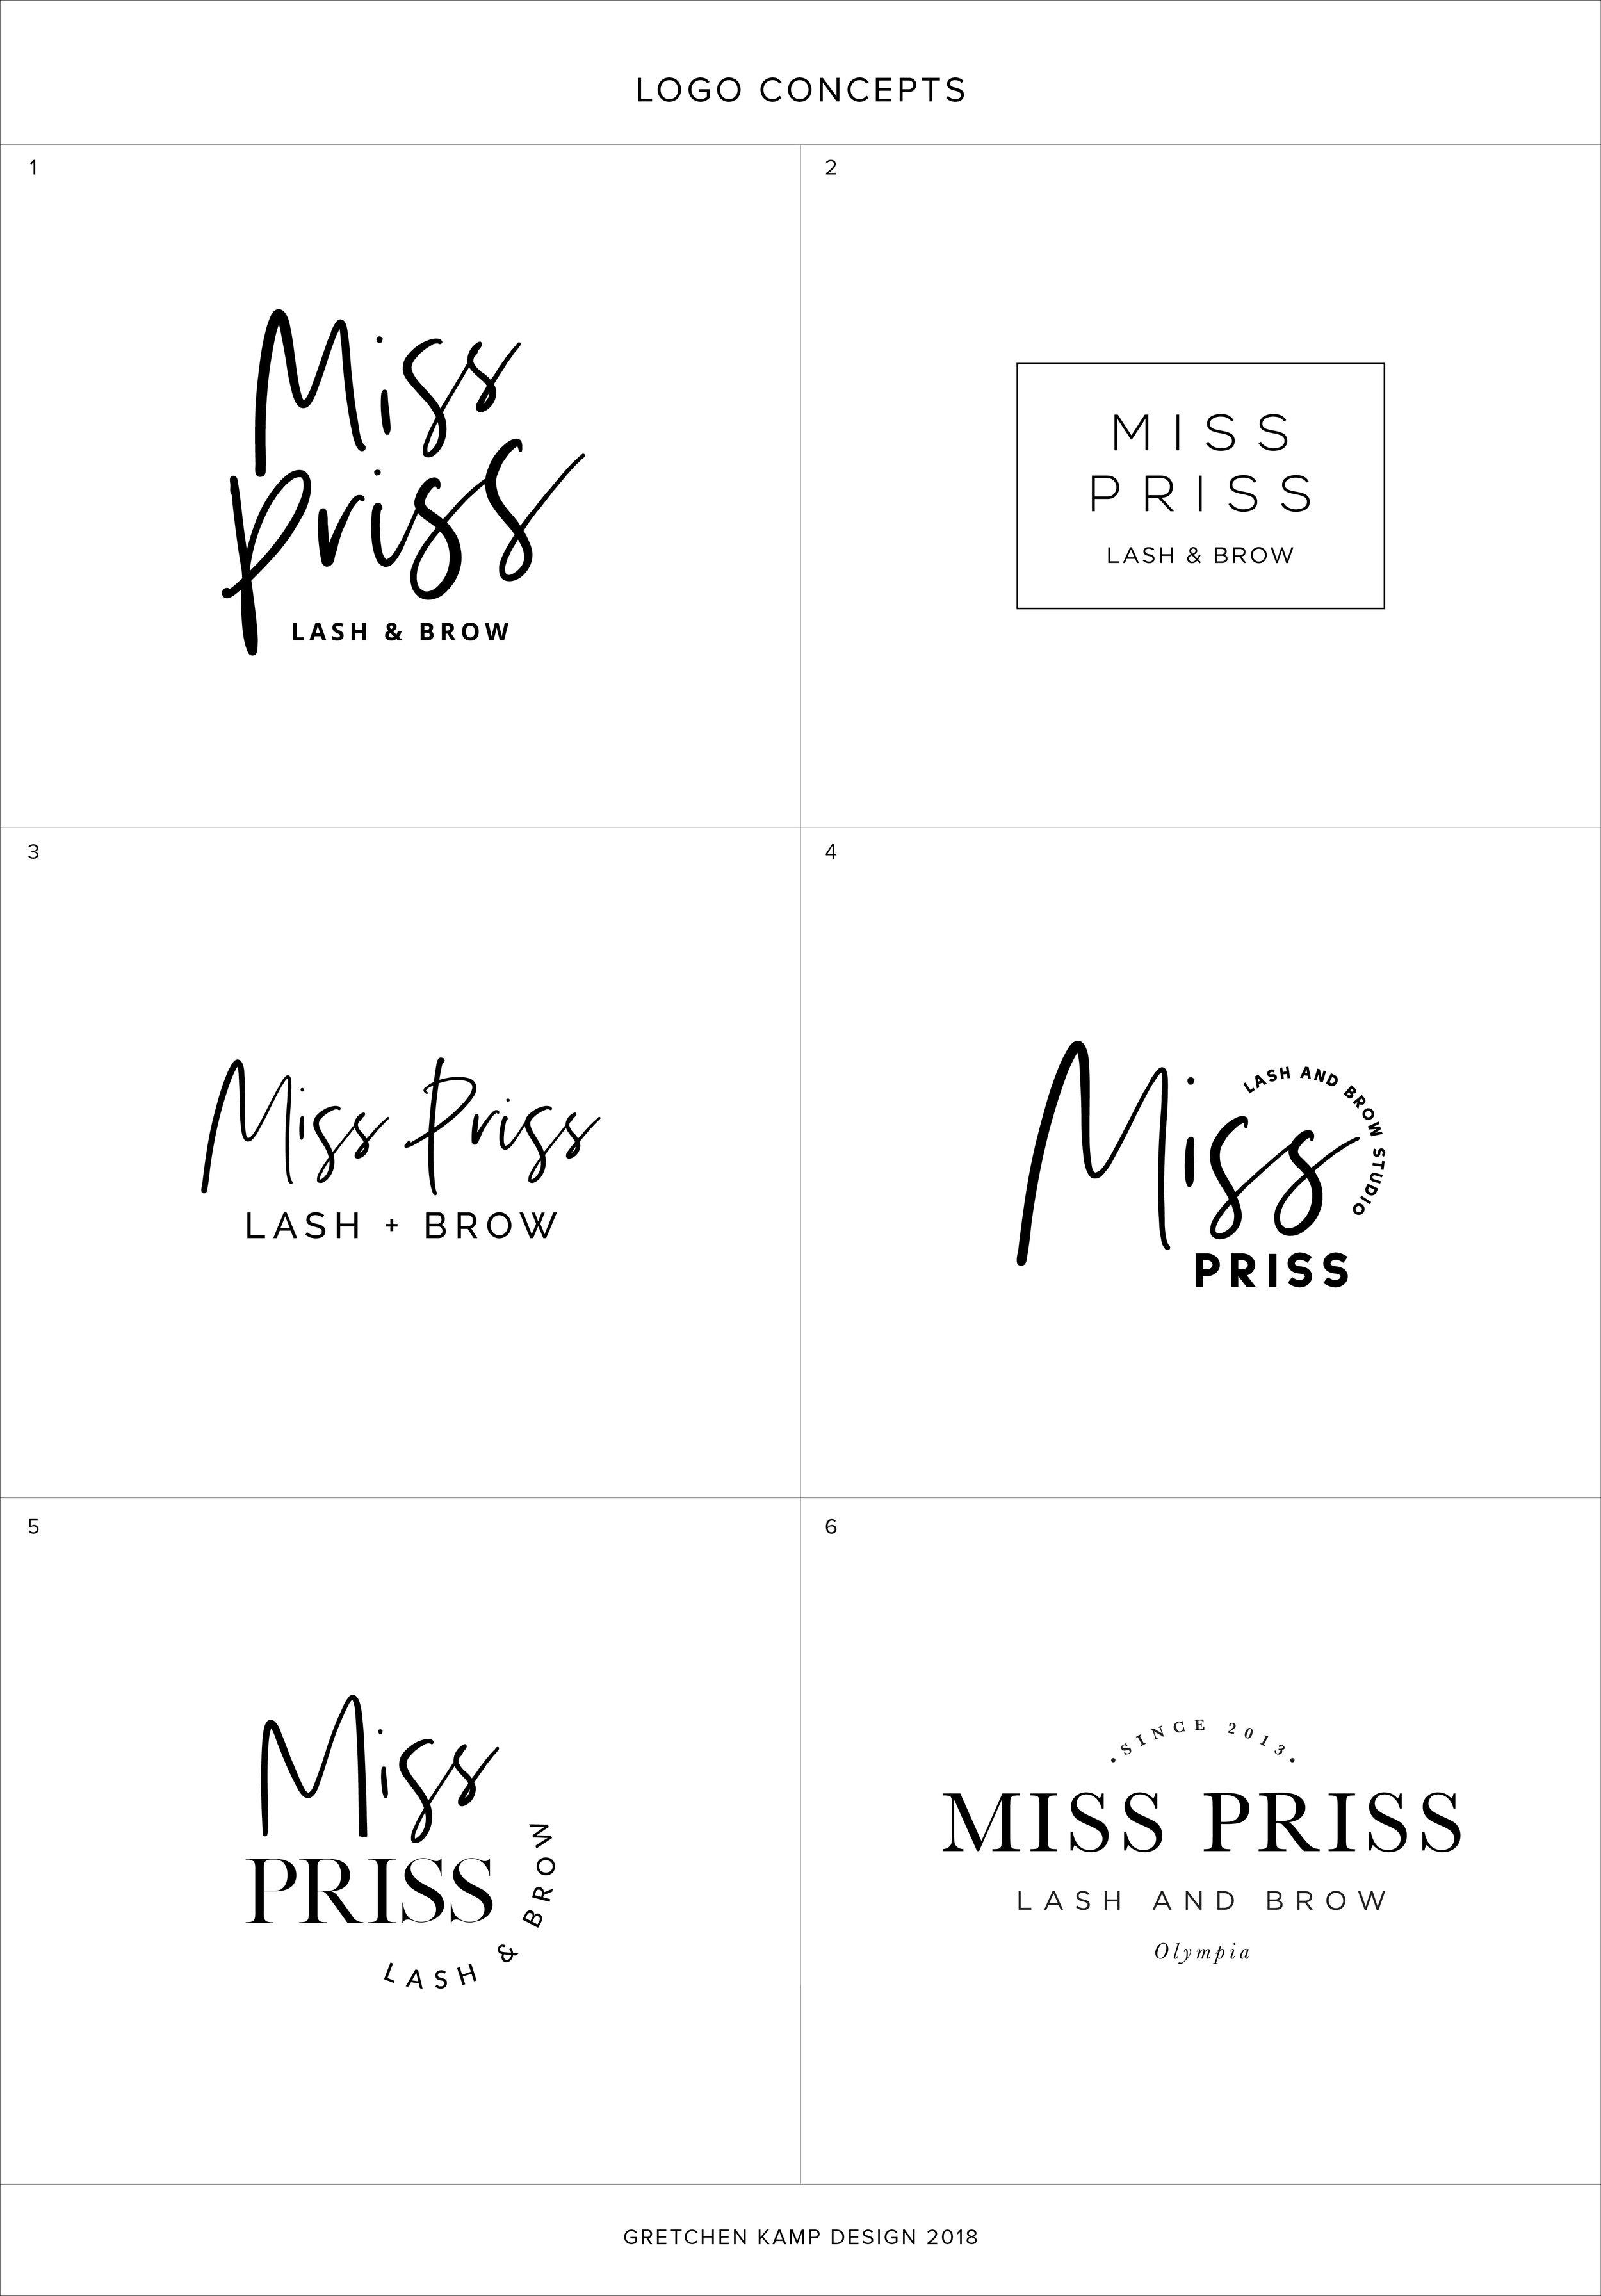 MissPrissLash&Brow_logos_v01.jpg